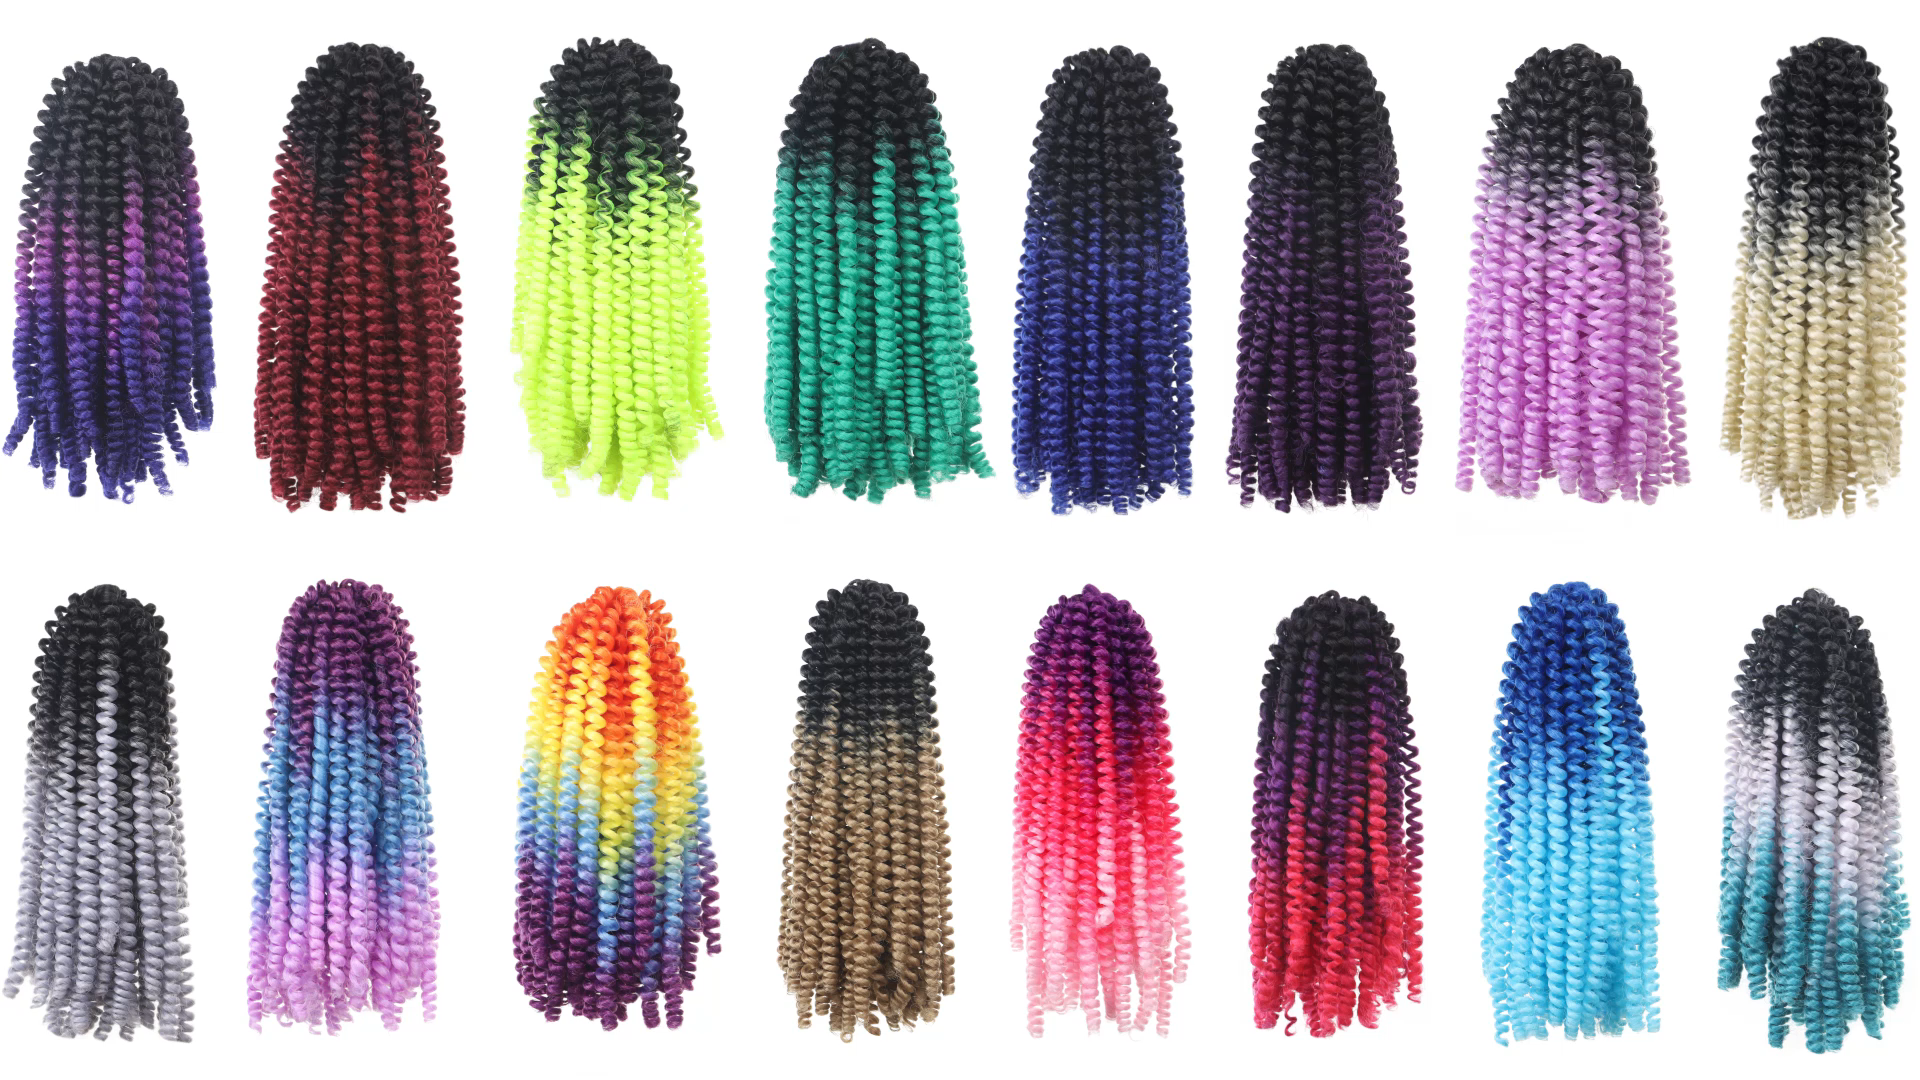 Fabrik Outlet Häkeln Geflecht Bombe Twist Braid Häkeln Haar Ombre Farbe Synthetische Flauschigen Haar Verlängerung Frühling Twist Häkeln Haar